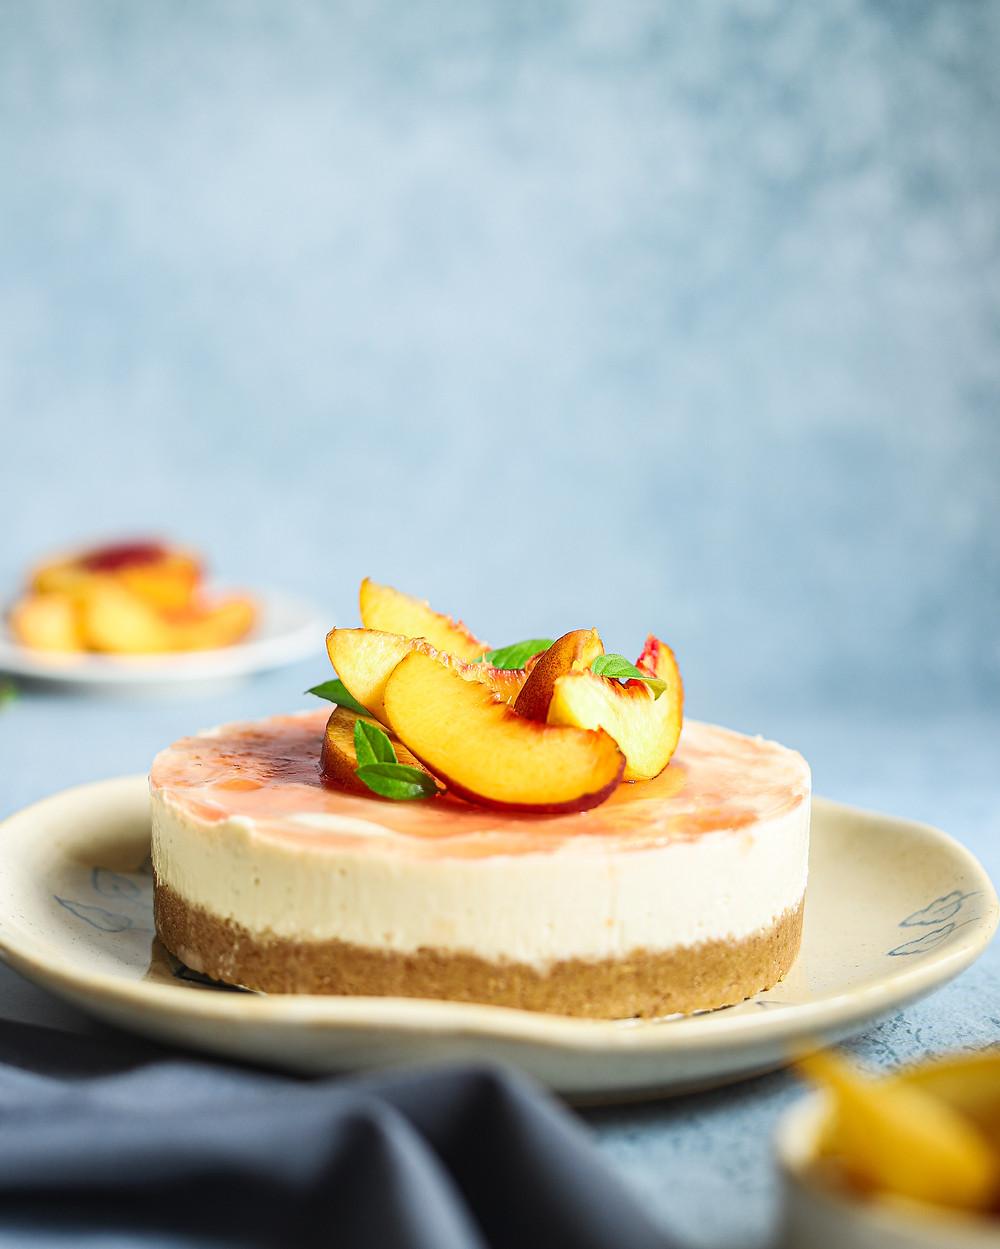 No-bake Eggless and Gluten free Peach cheesecake